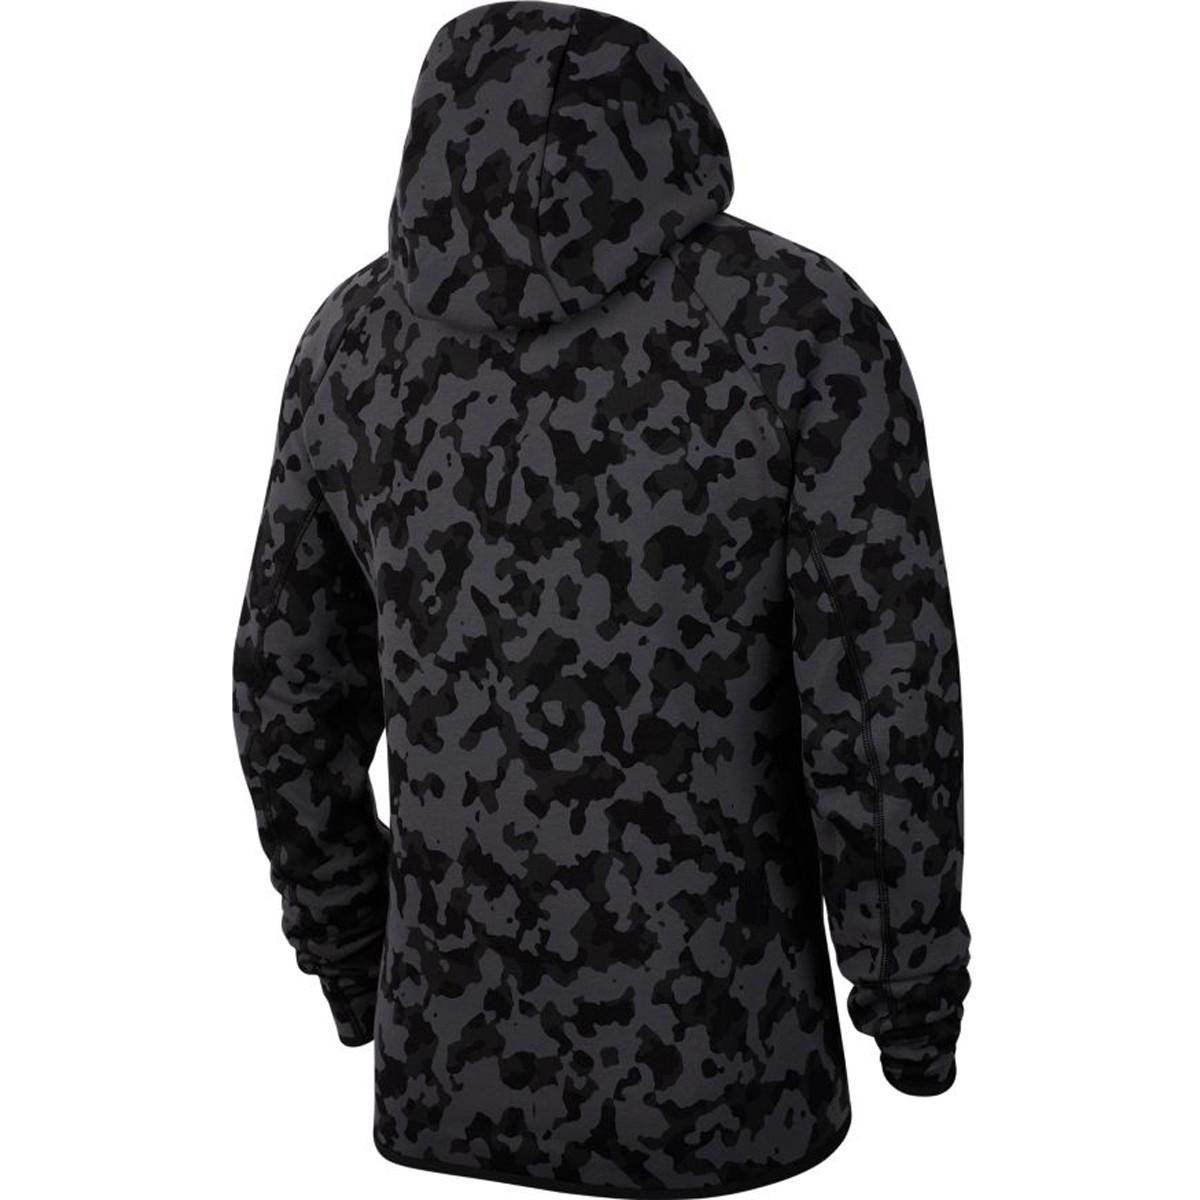 Veste Nike Tech Fleece Camouflage Veste HOMME